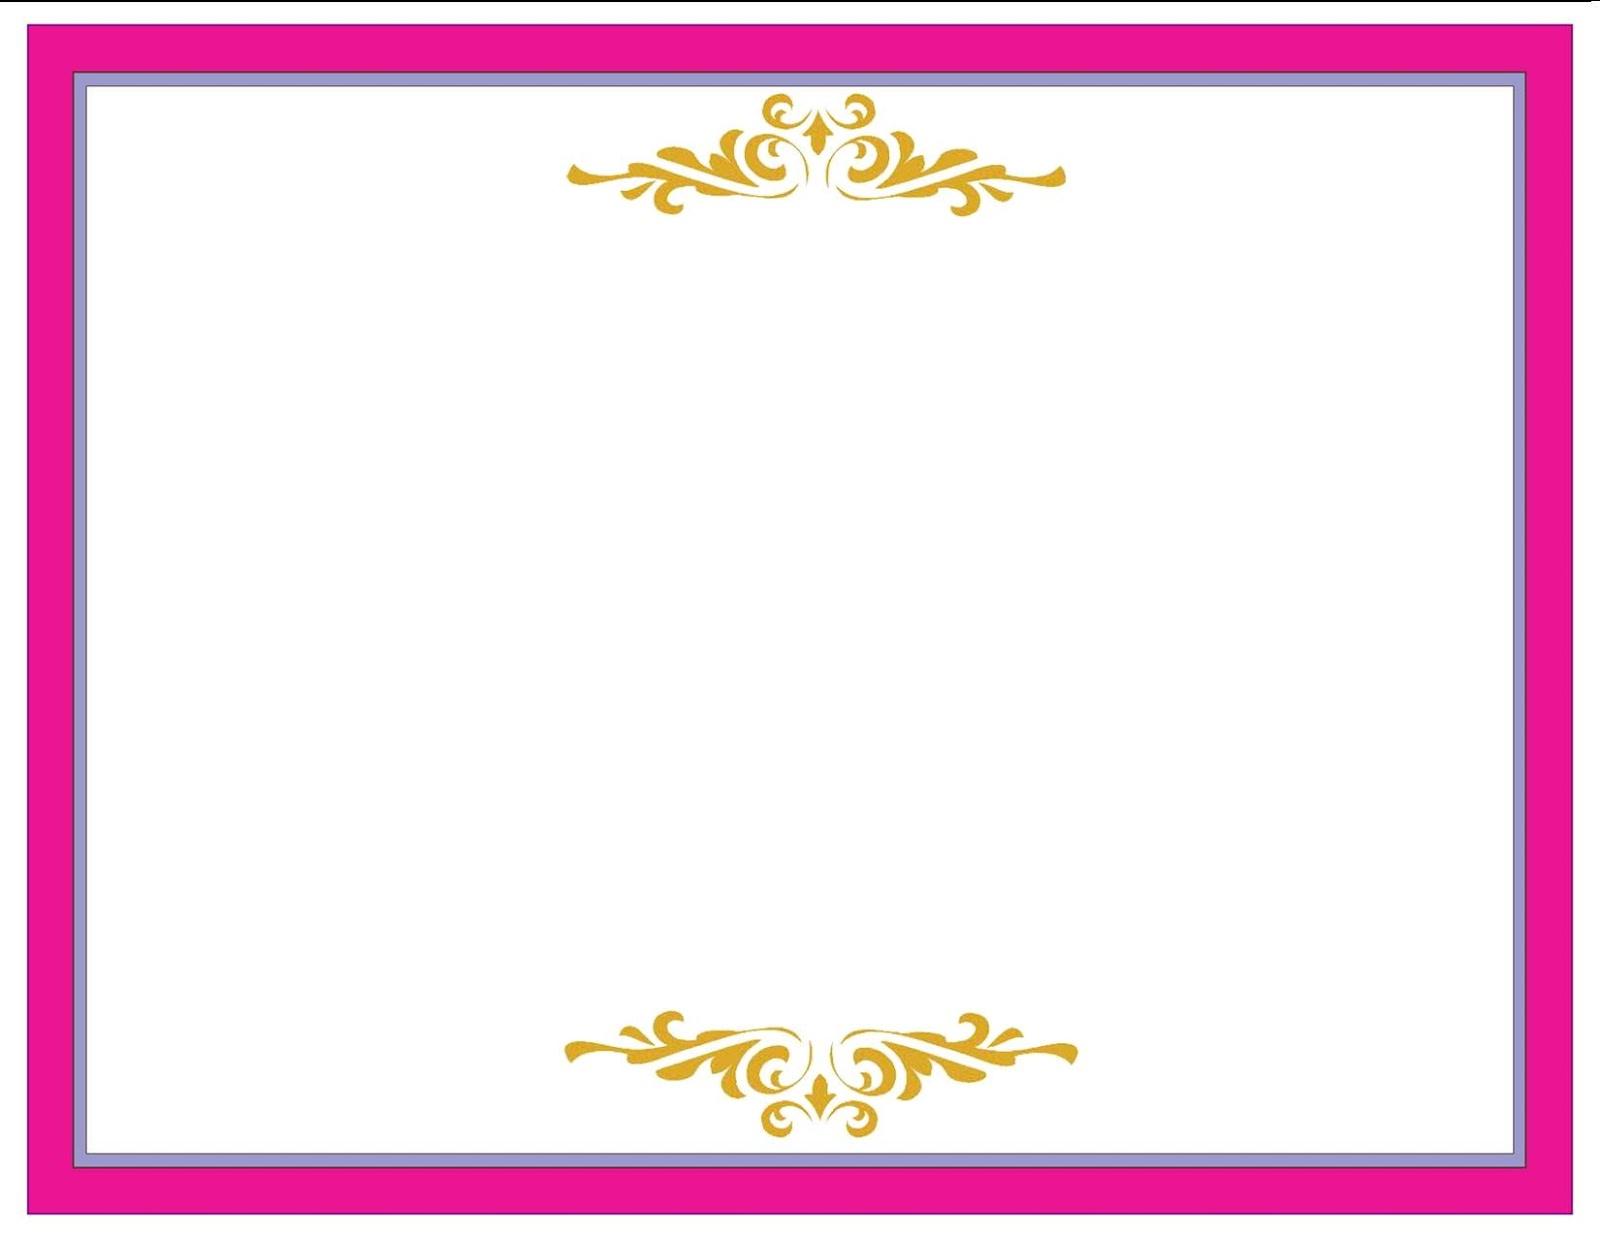 http://3.bp.blogspot.com/-HLq24DHkYqU/T_ix1IbJkaI/AAAAAAAABeg/XhUUjTeVt-Q/s1600/pink%252Bframe%252Bborders.jpg